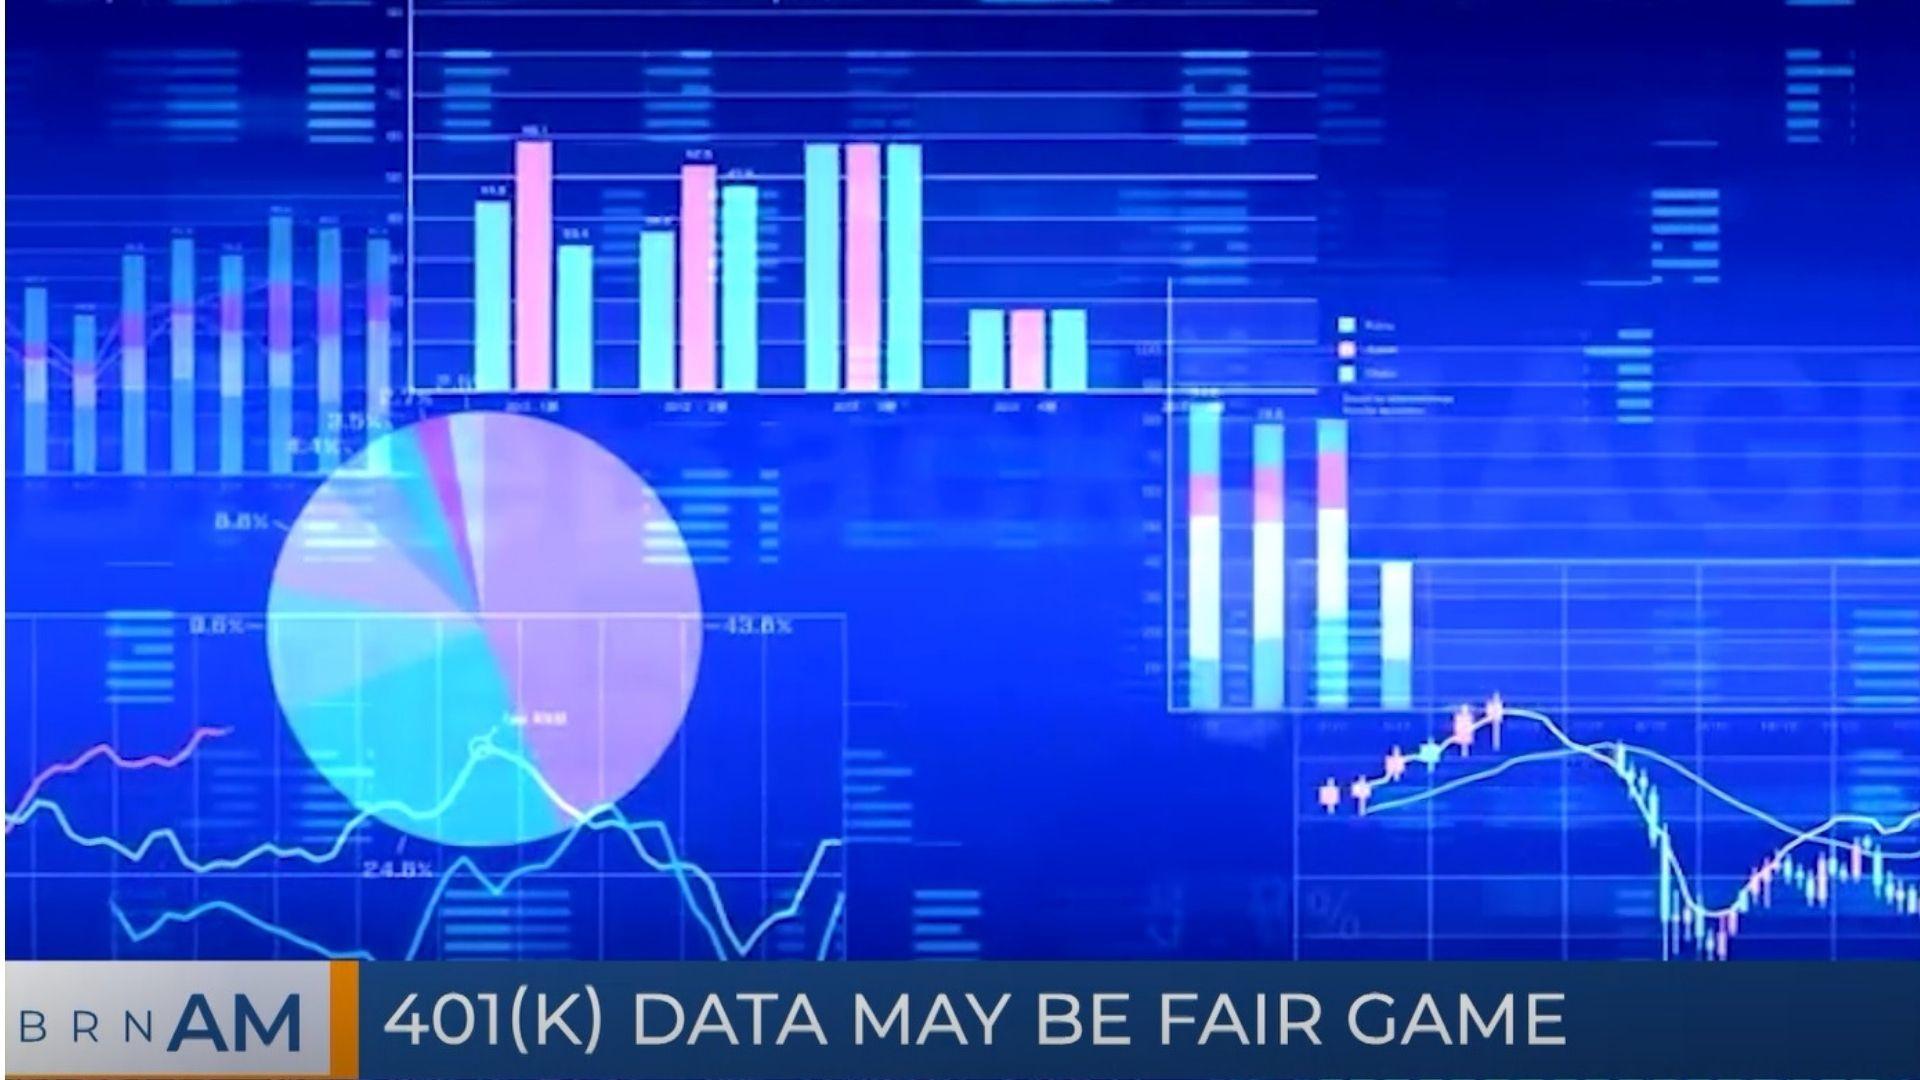 BRN AM | 401(k) data may be fair game